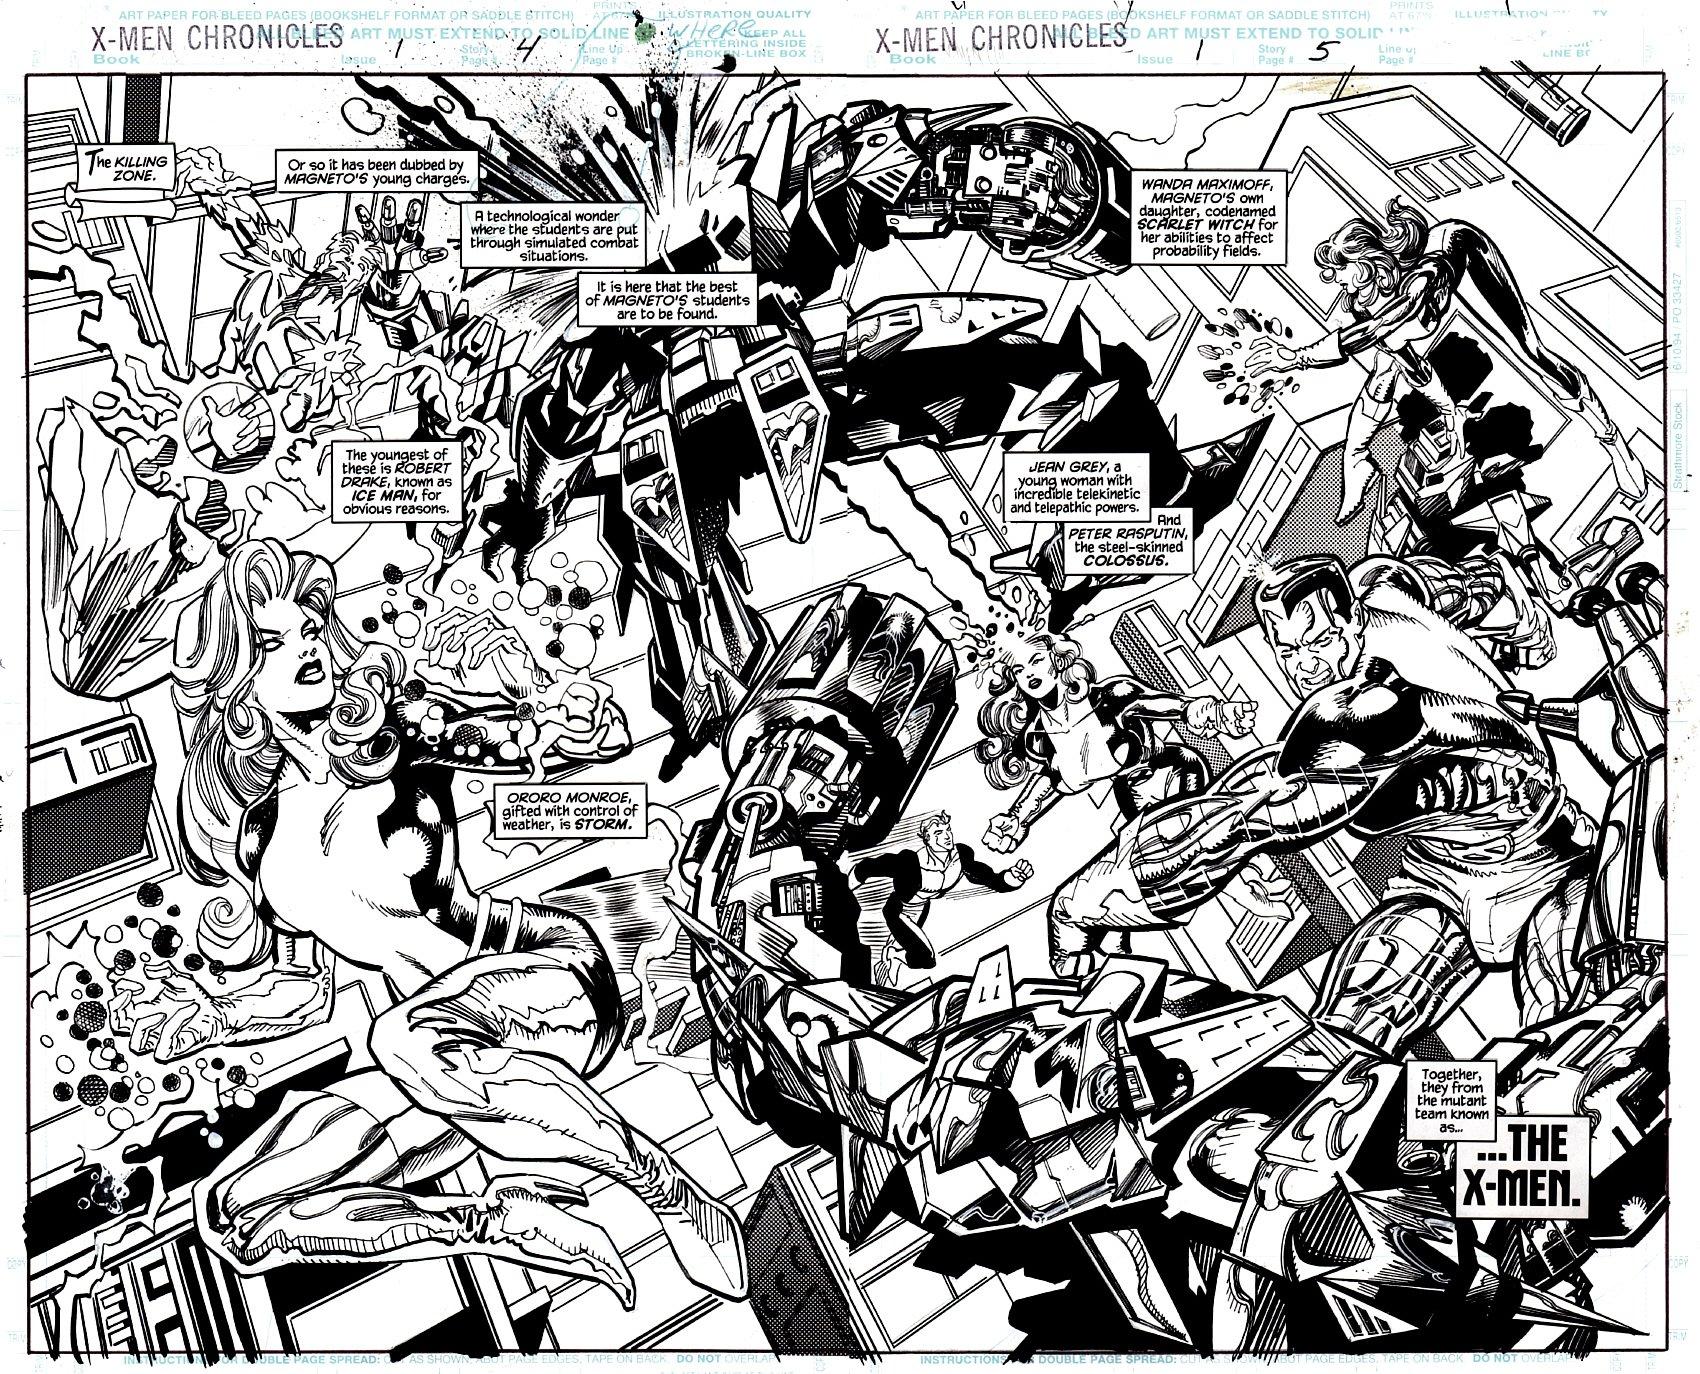 X-Men Chronicles #1 p 4-5 Double Spread Splash (ENTIRE TEAM BATTLING IN MAGNETO'S KILLING ZONE!) 1994